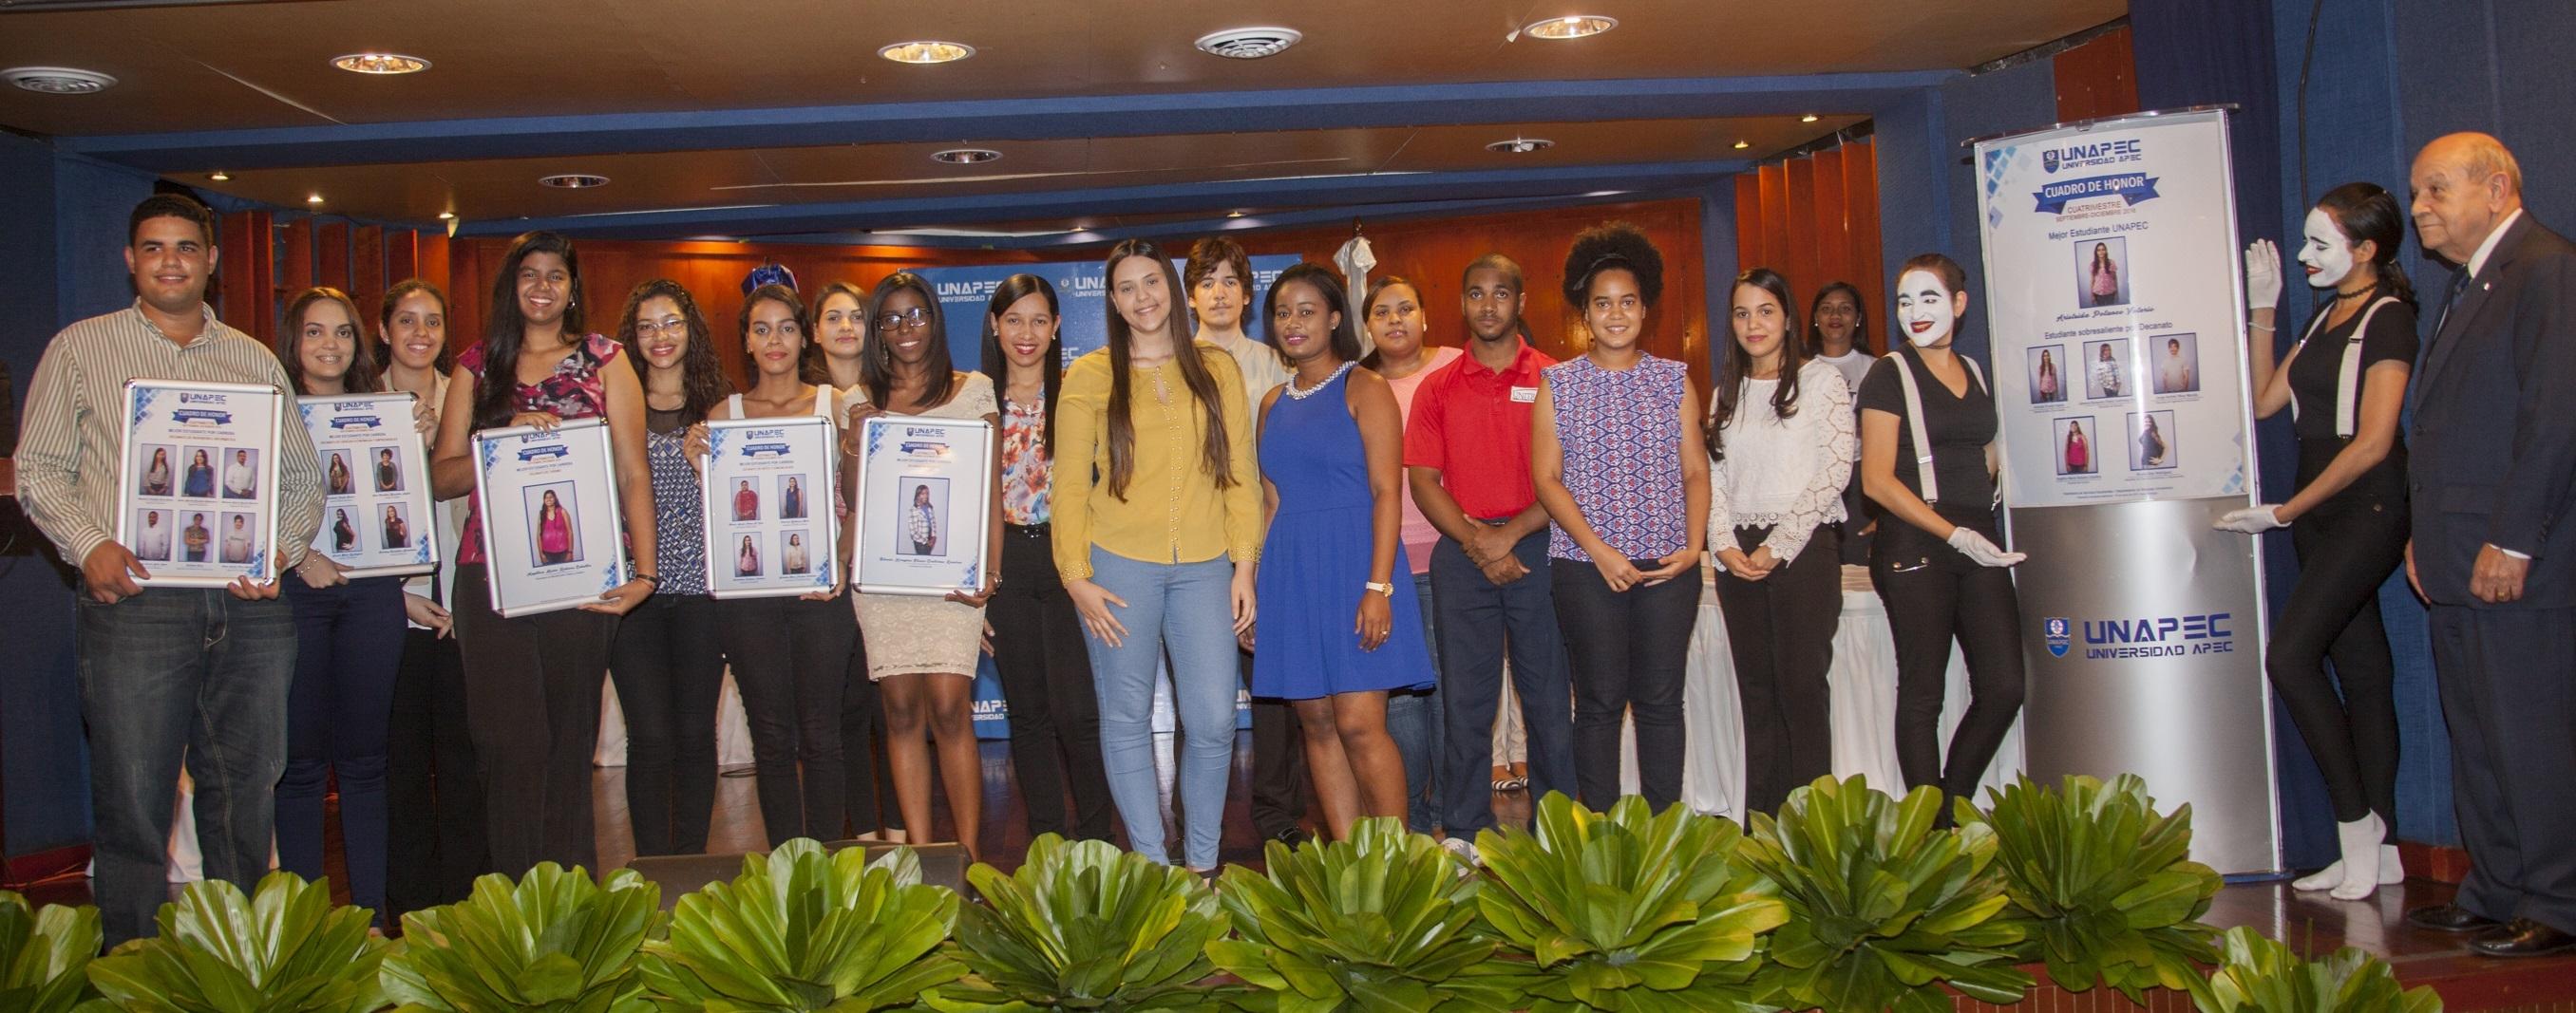 Mejores Estudiantes Cuatrimestre Septiembre - diciembre 2016.